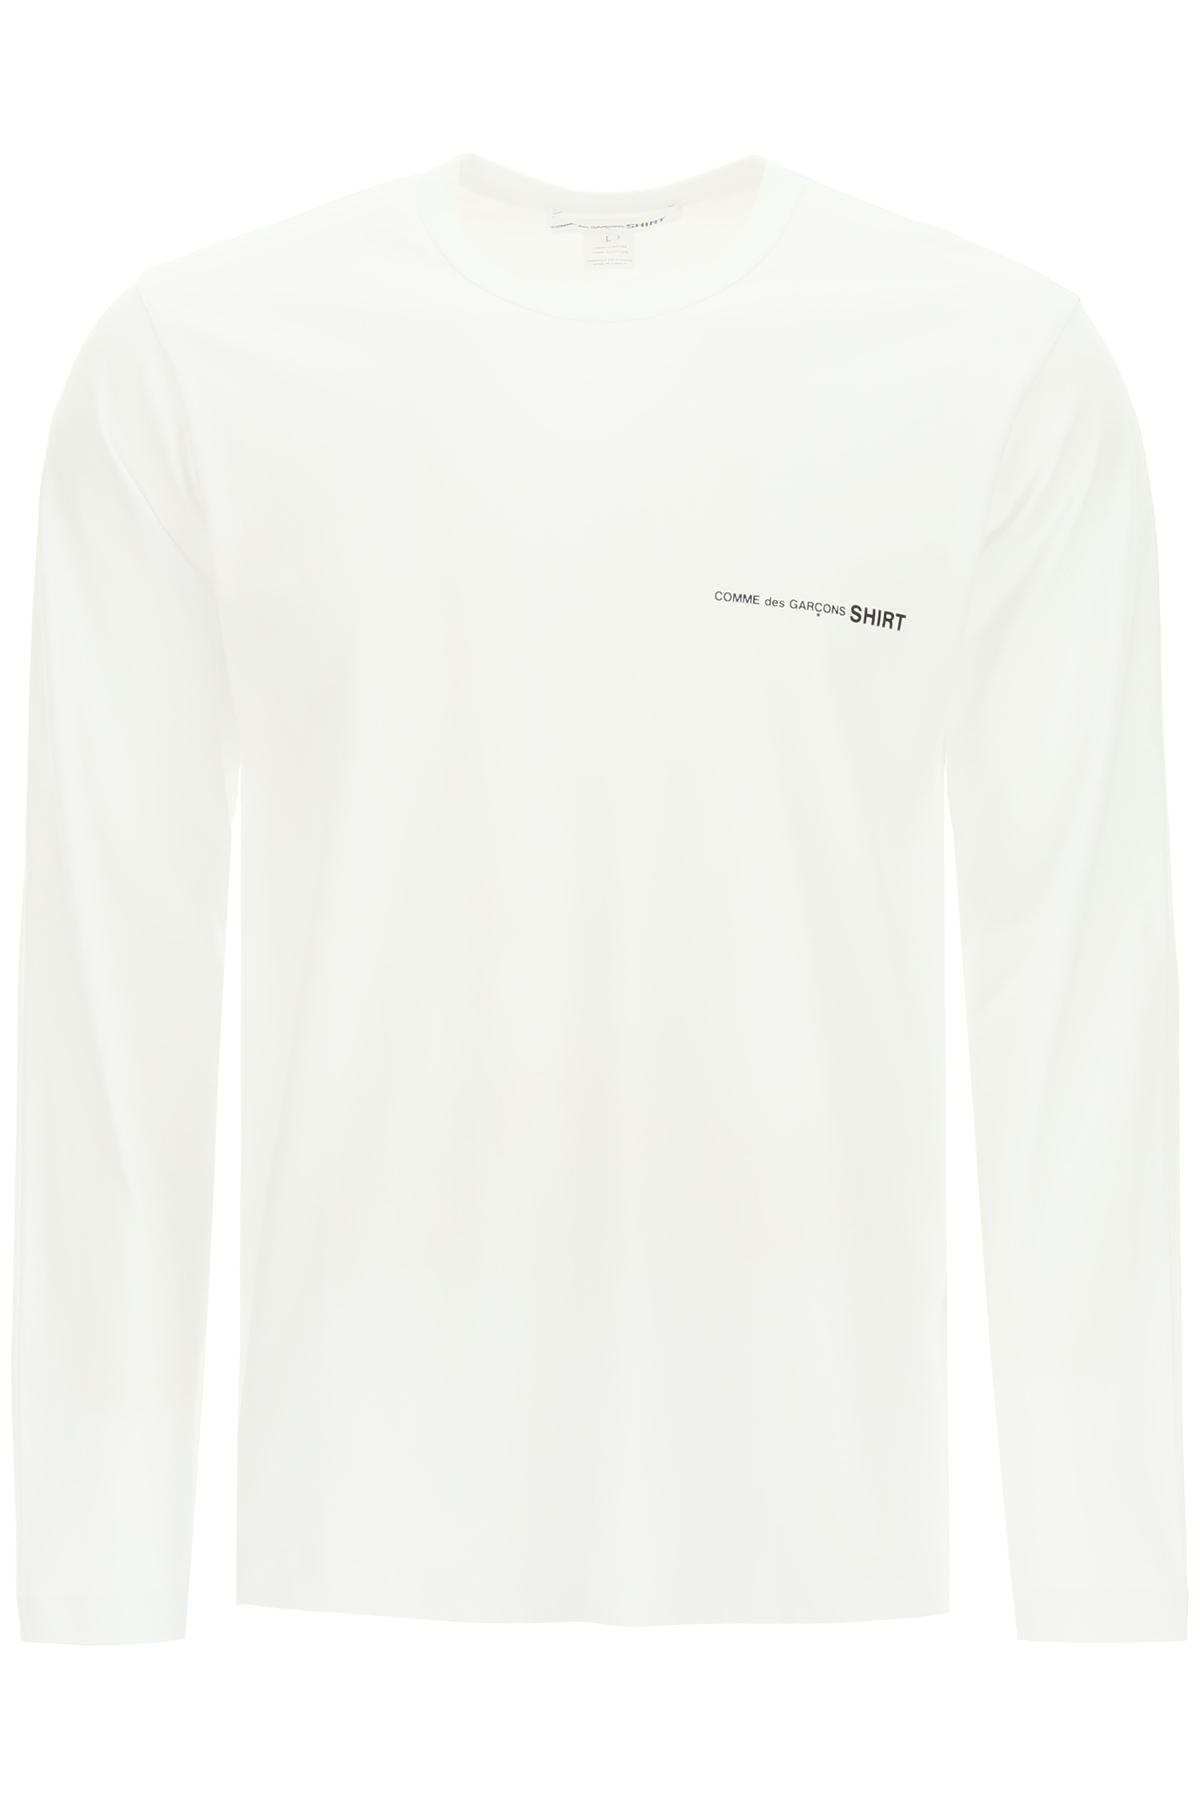 Comme des garcons shirt t- shirt manica lunga con stampa logo